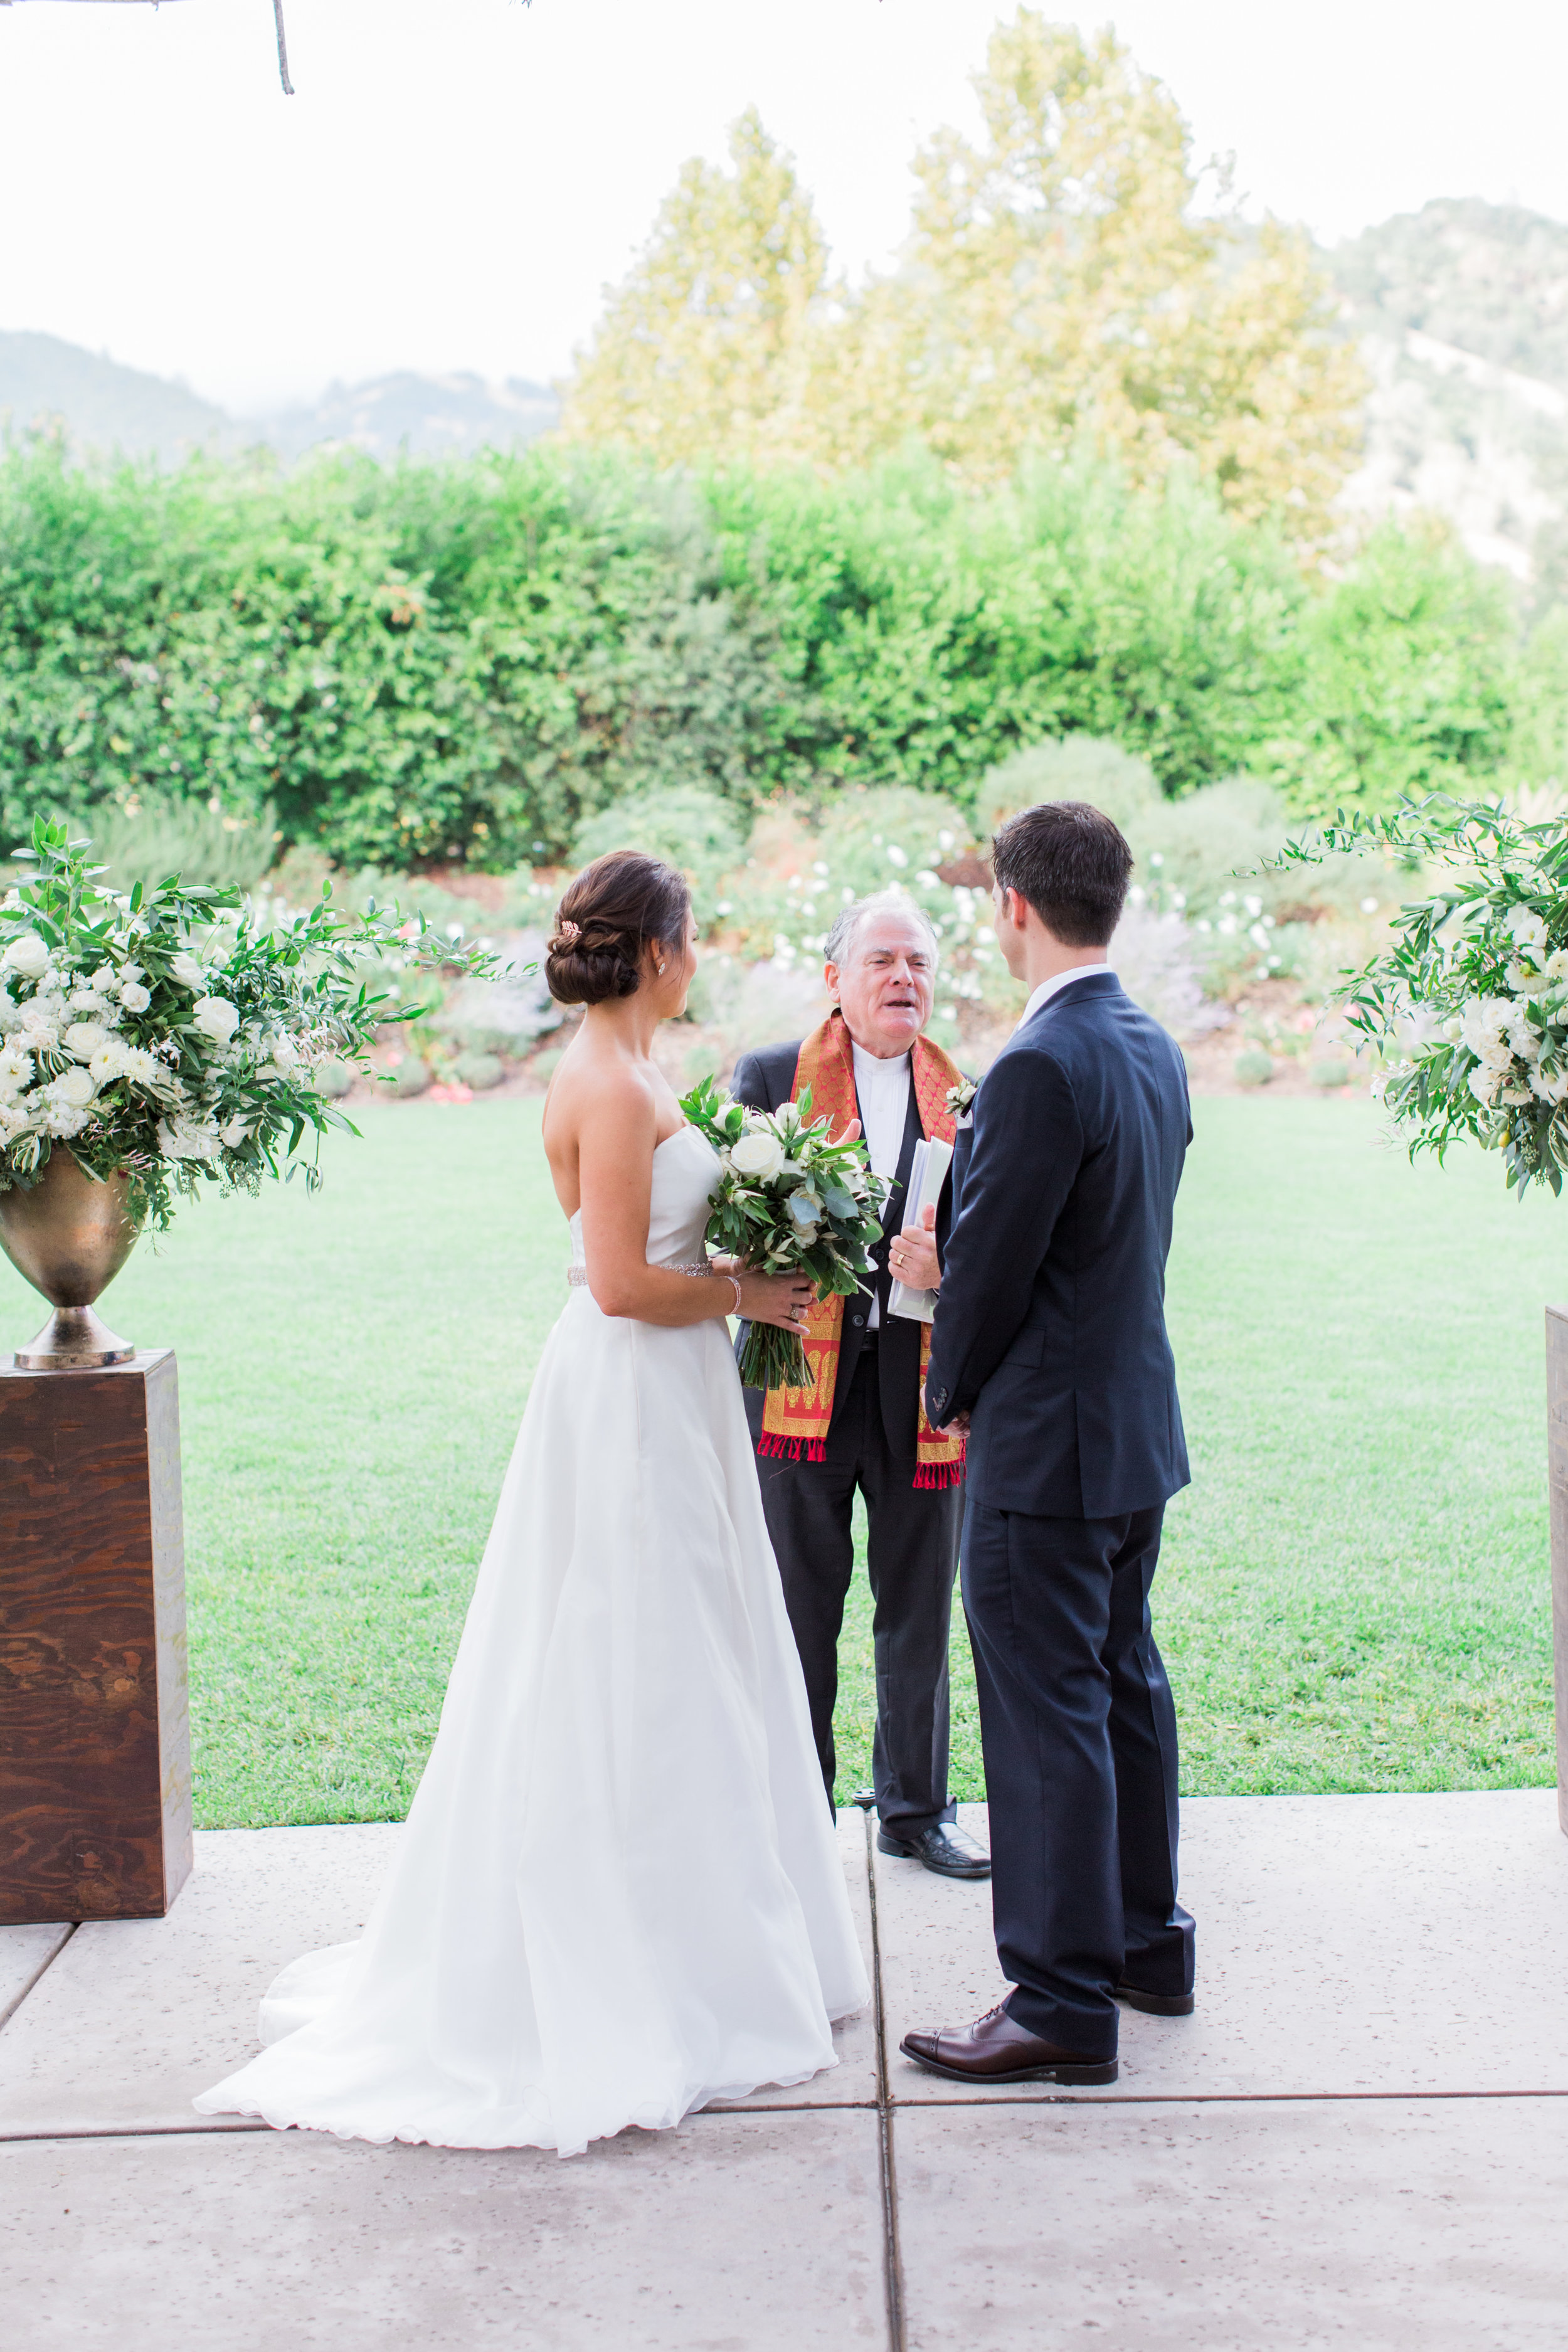 intimate-wedding-at-solage-calistoga-in-napa-62.jpg